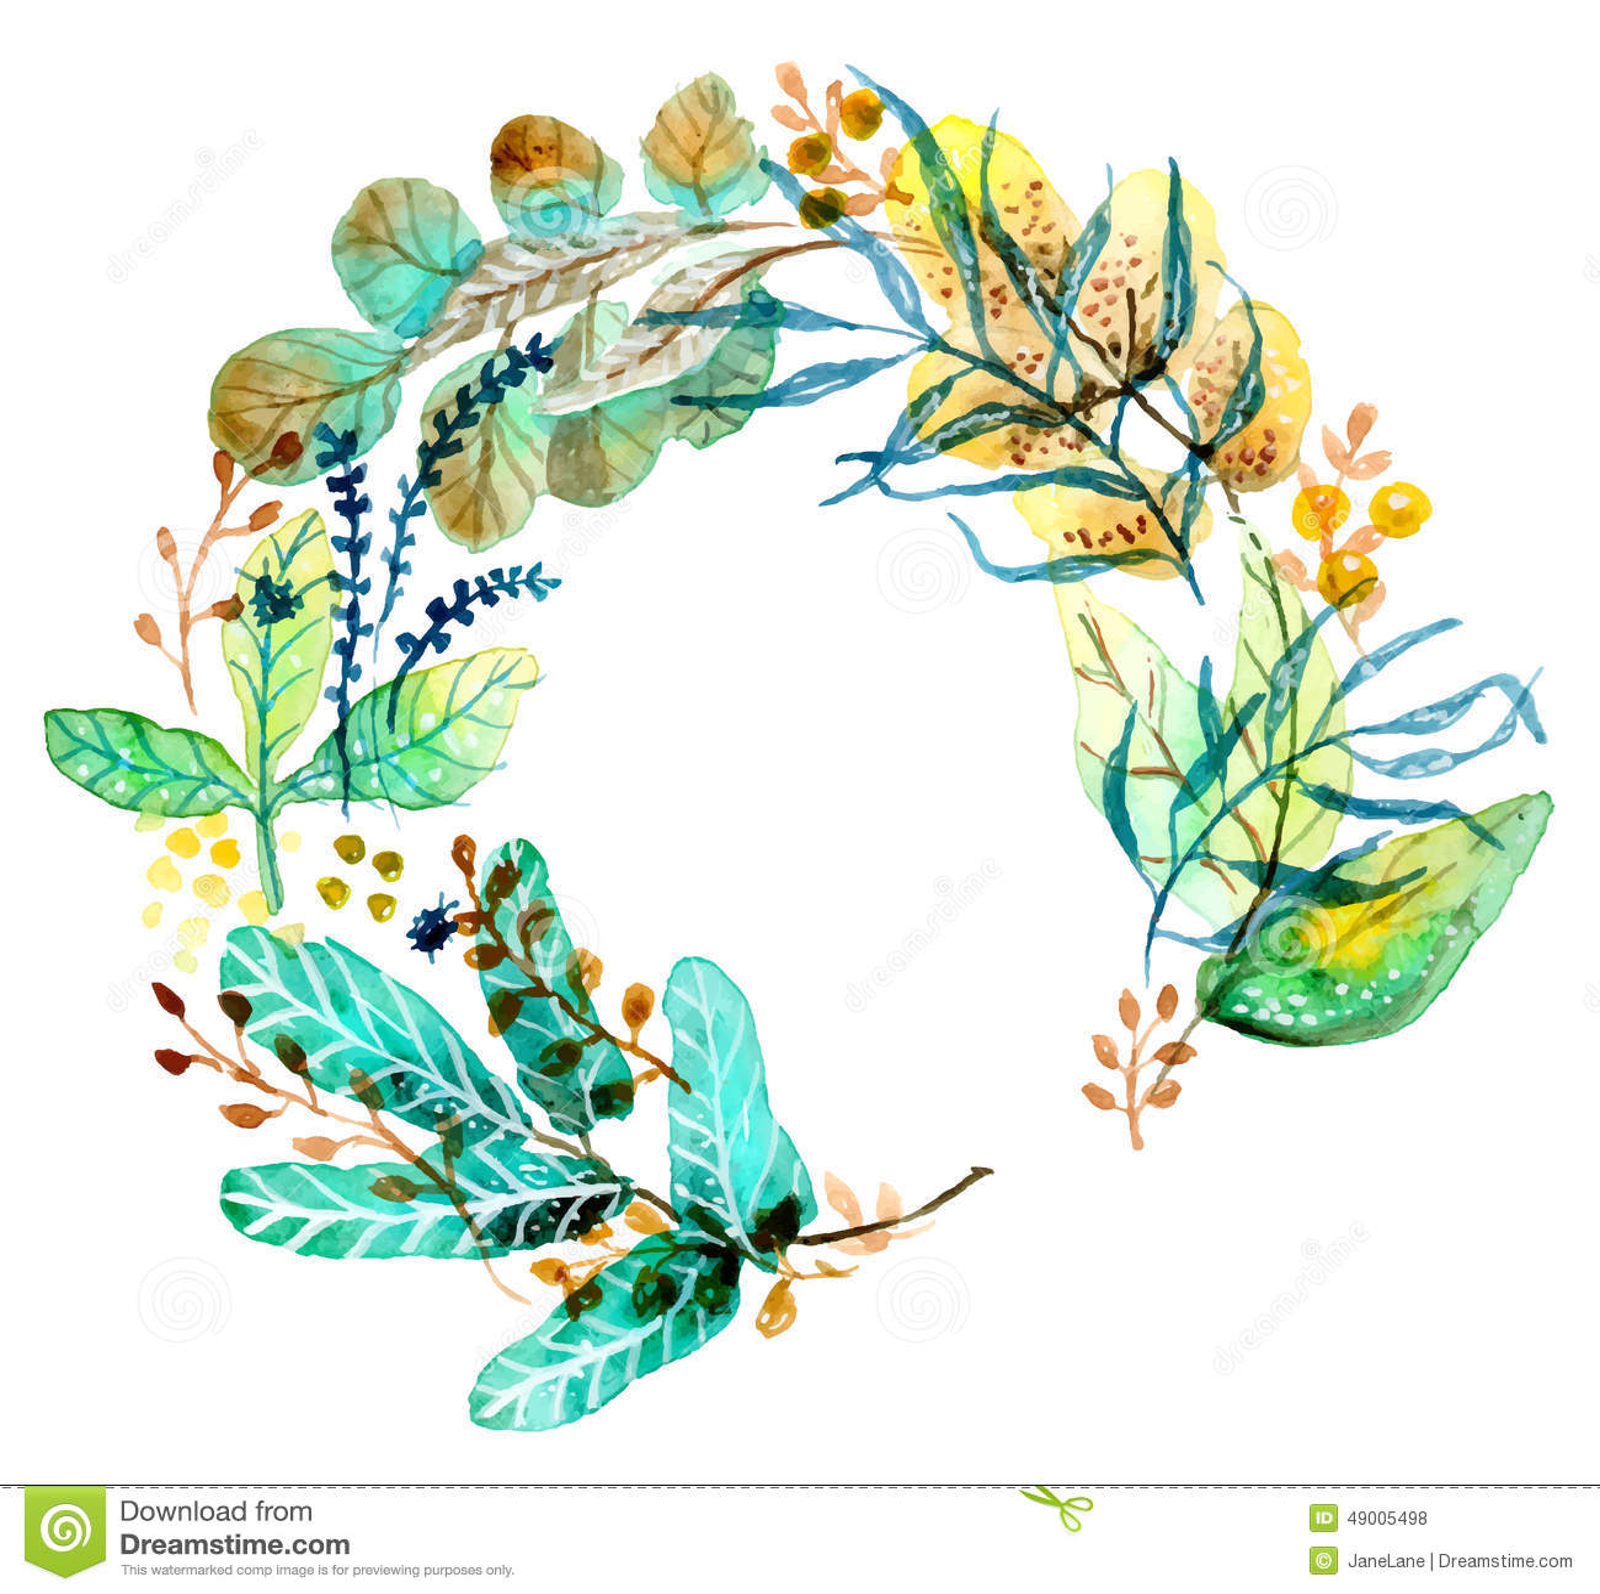 Watercolor Floral Frame, Colorful Natural Illustration ...